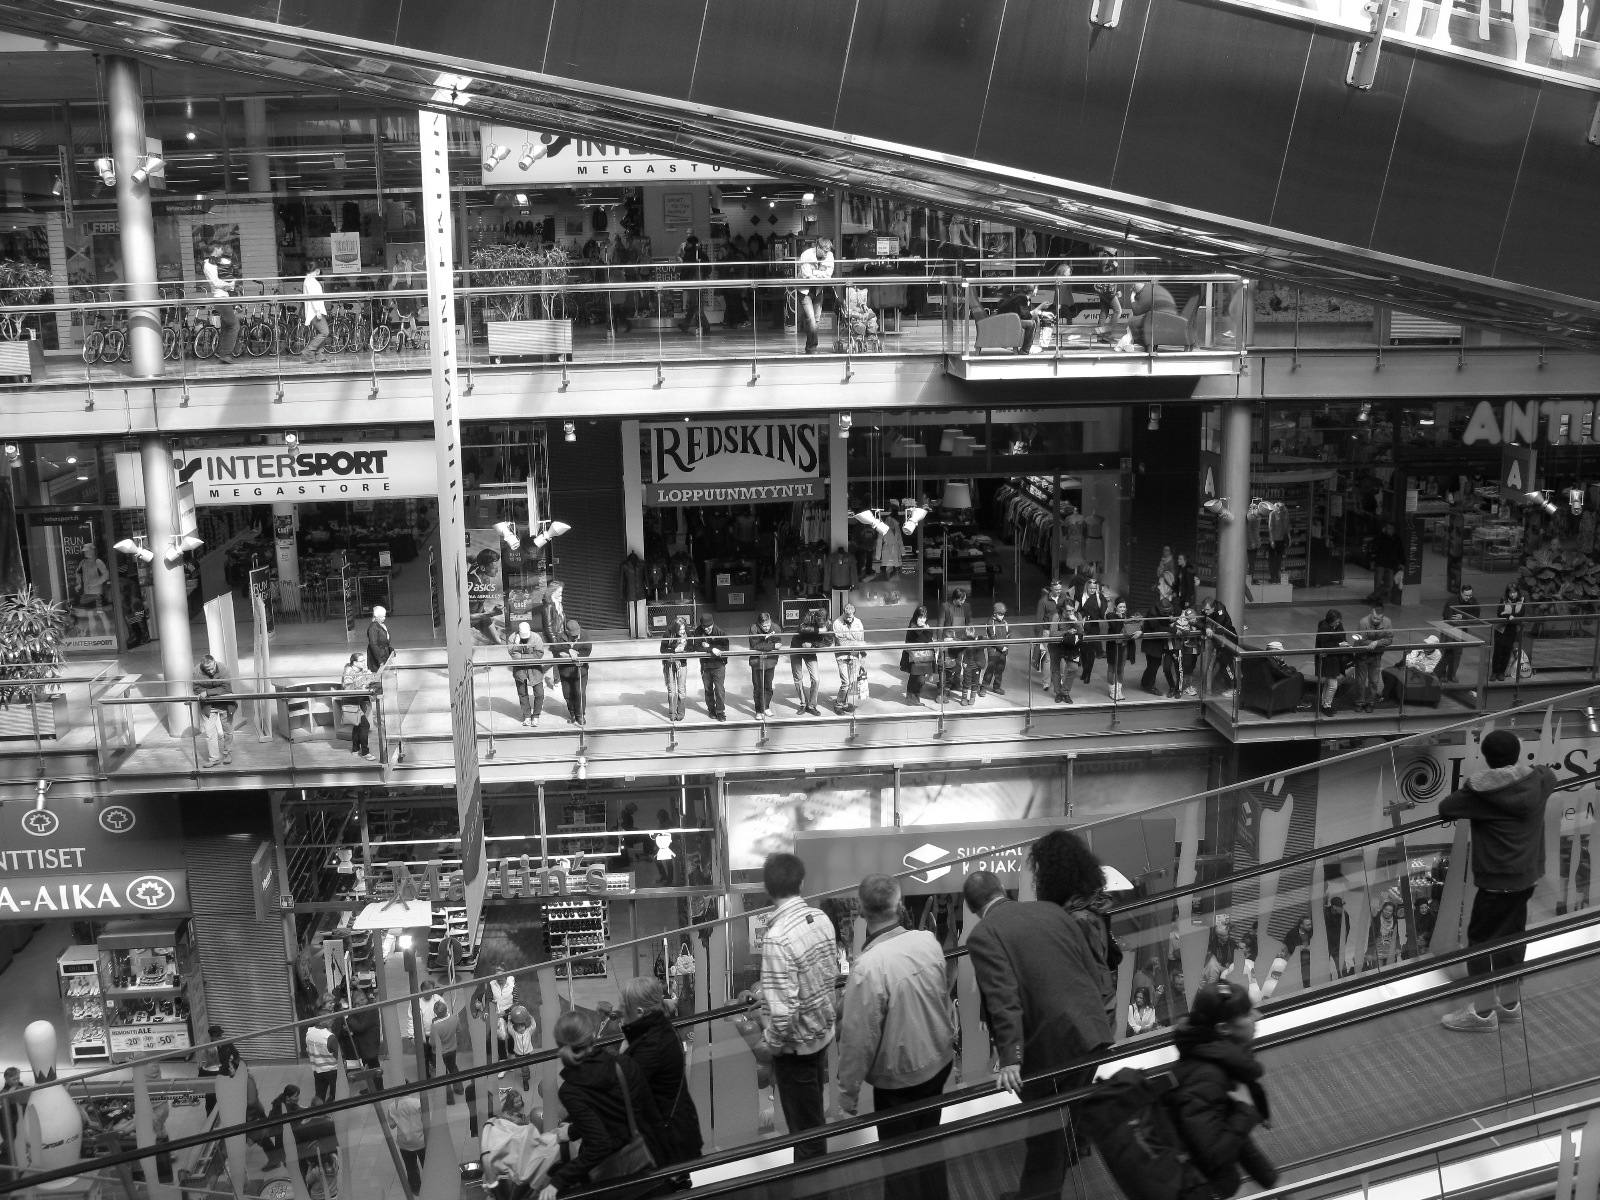 De Camino al Ikea en Esbovägen | Looking for a place in the world...